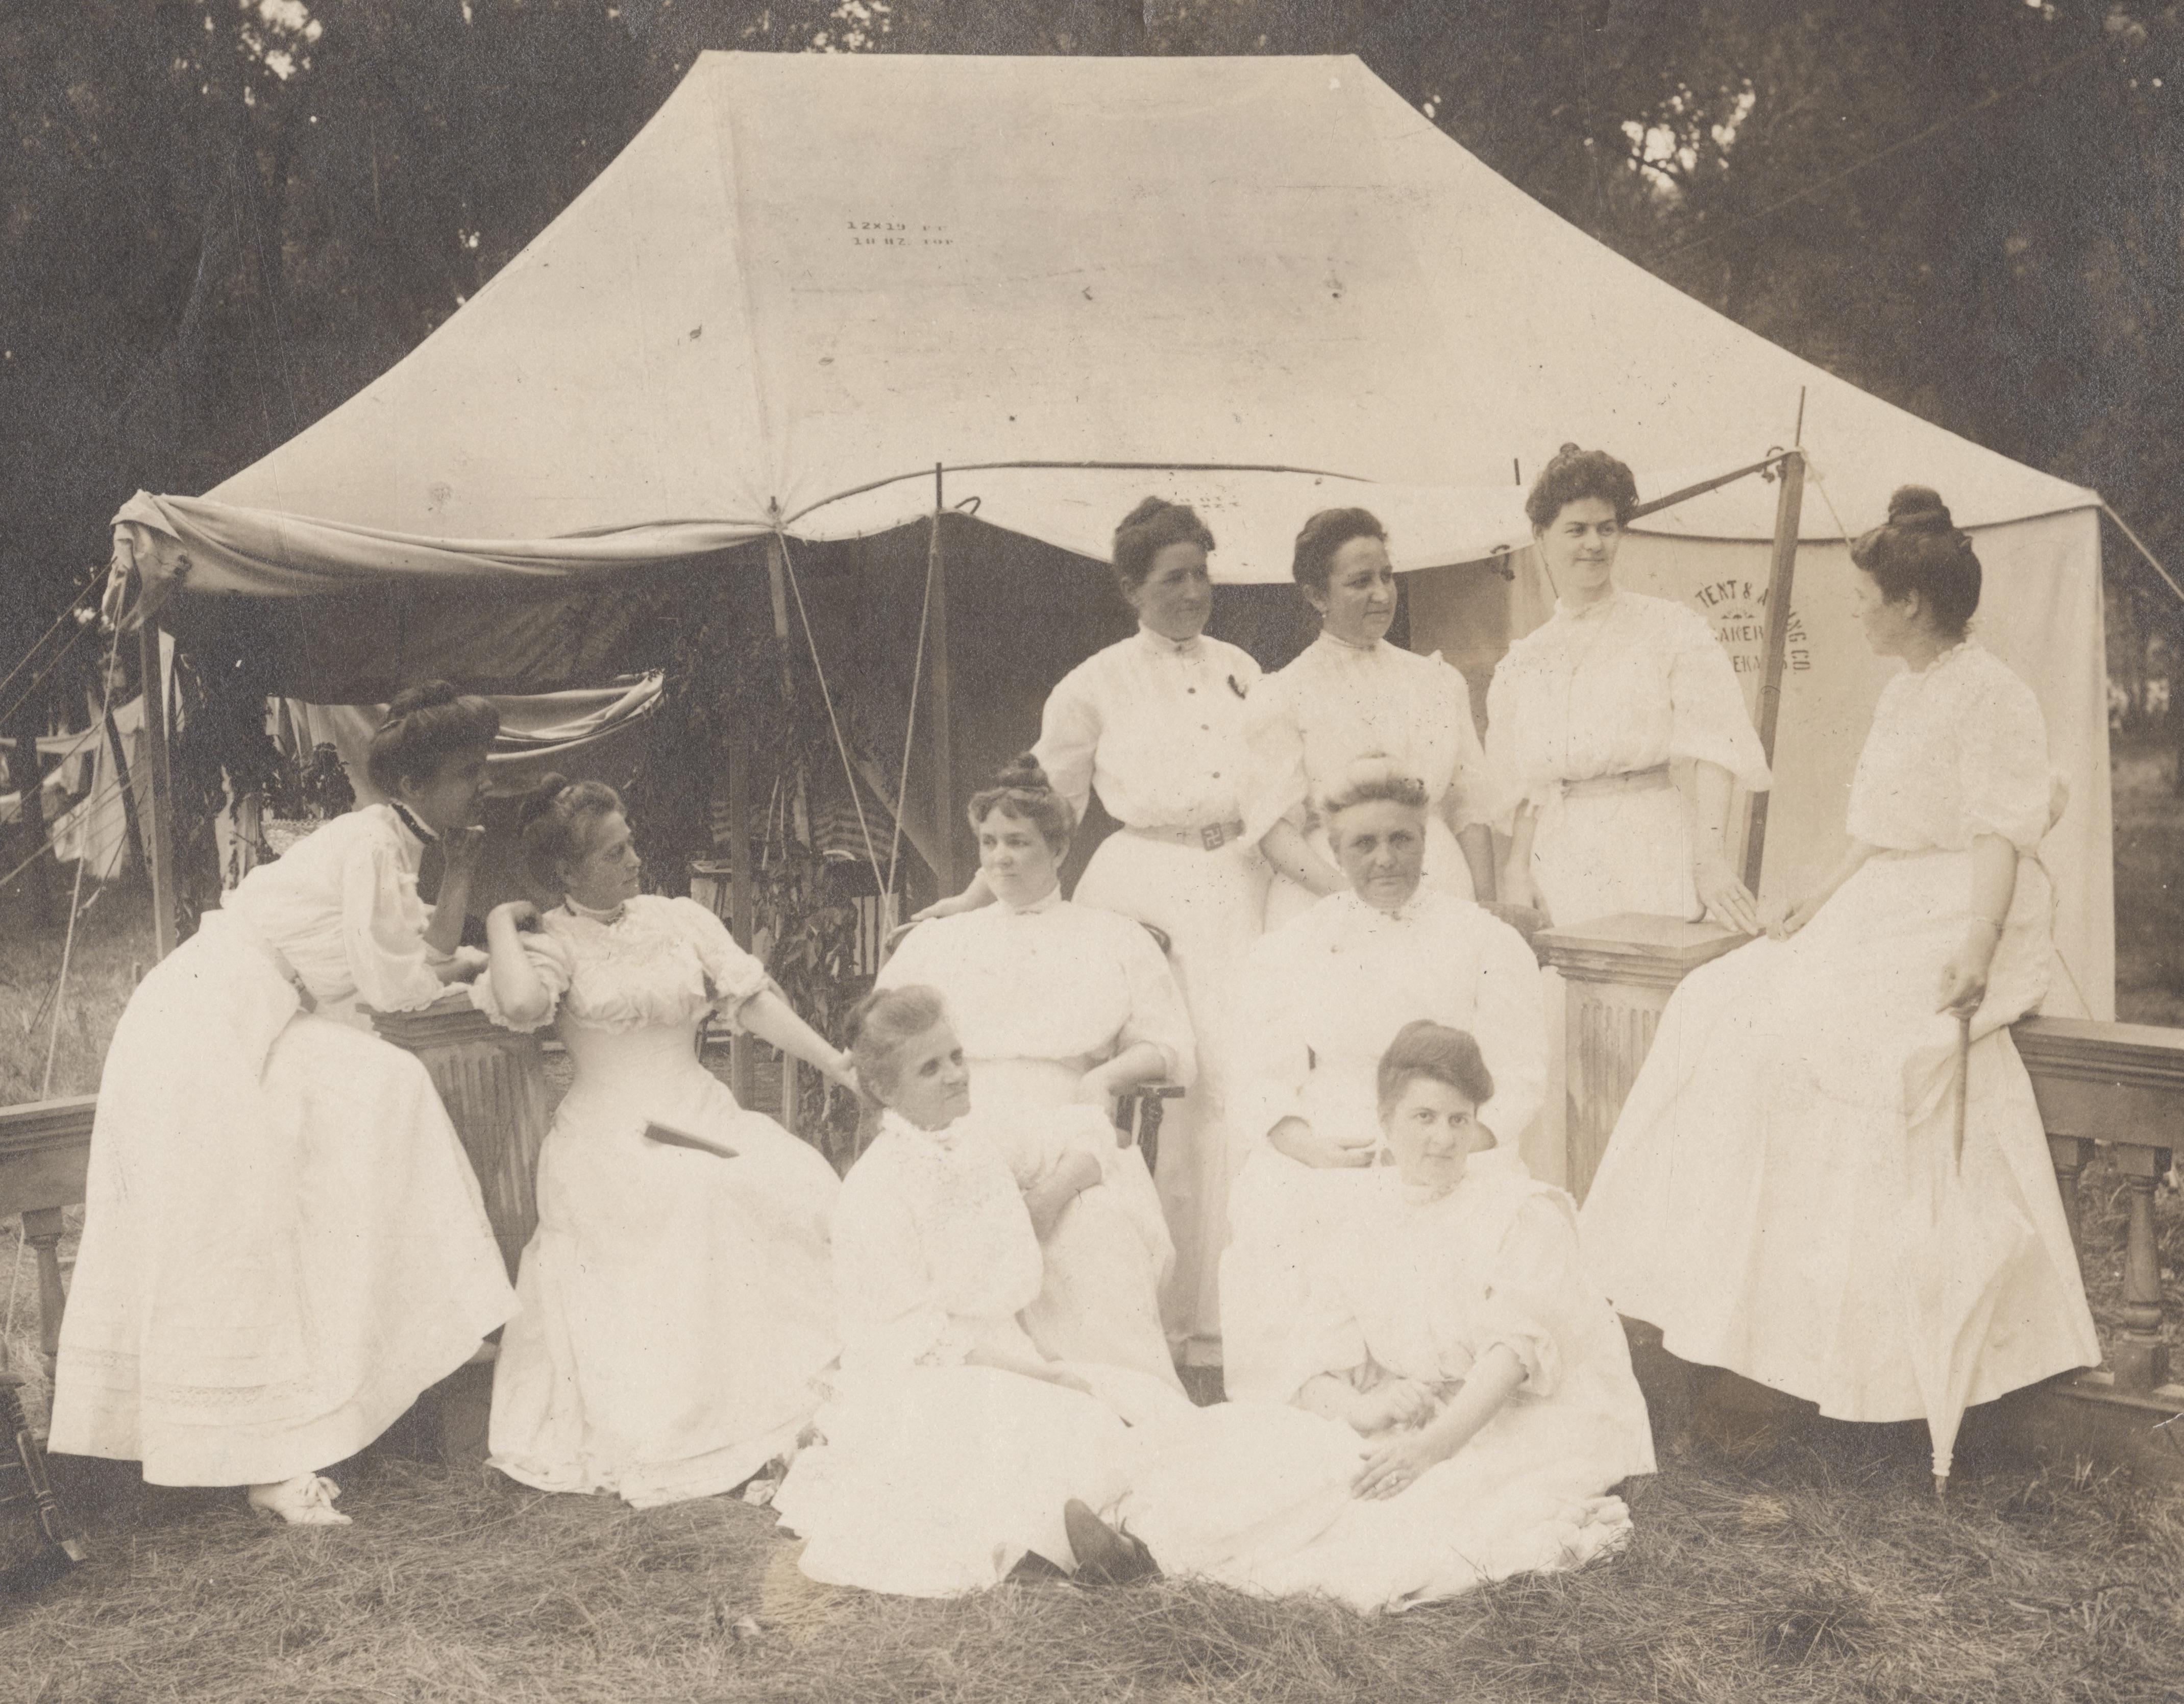 Online Program - Politics on the Platform: Woman Suffrage at the Chautauqua Event Image